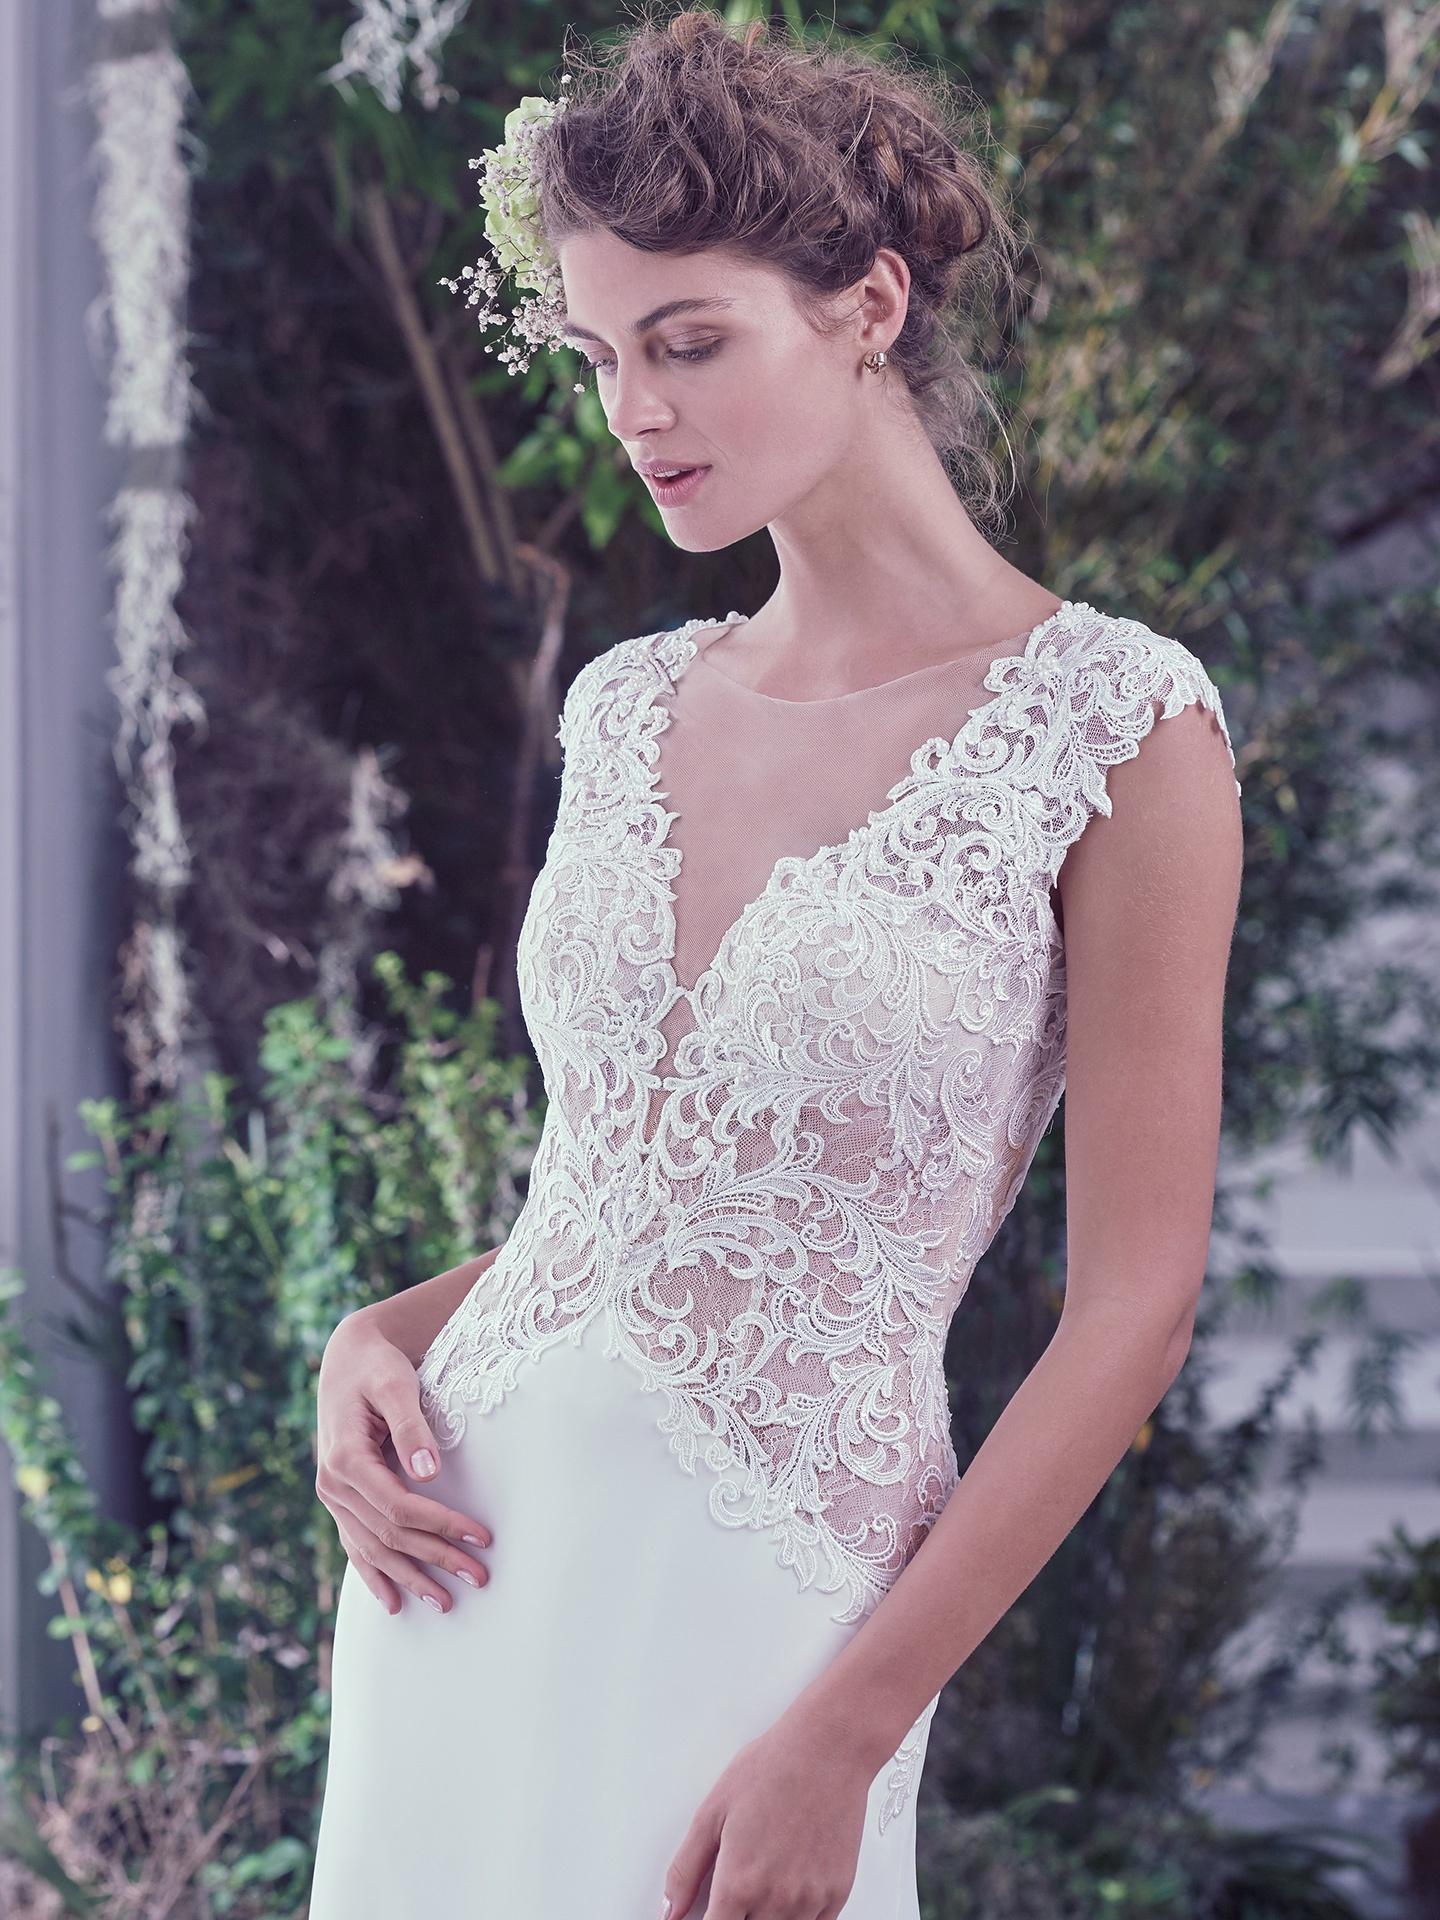 Vintage Wedding Dress with Illusion Bodice - Love Maggie : Love Maggie